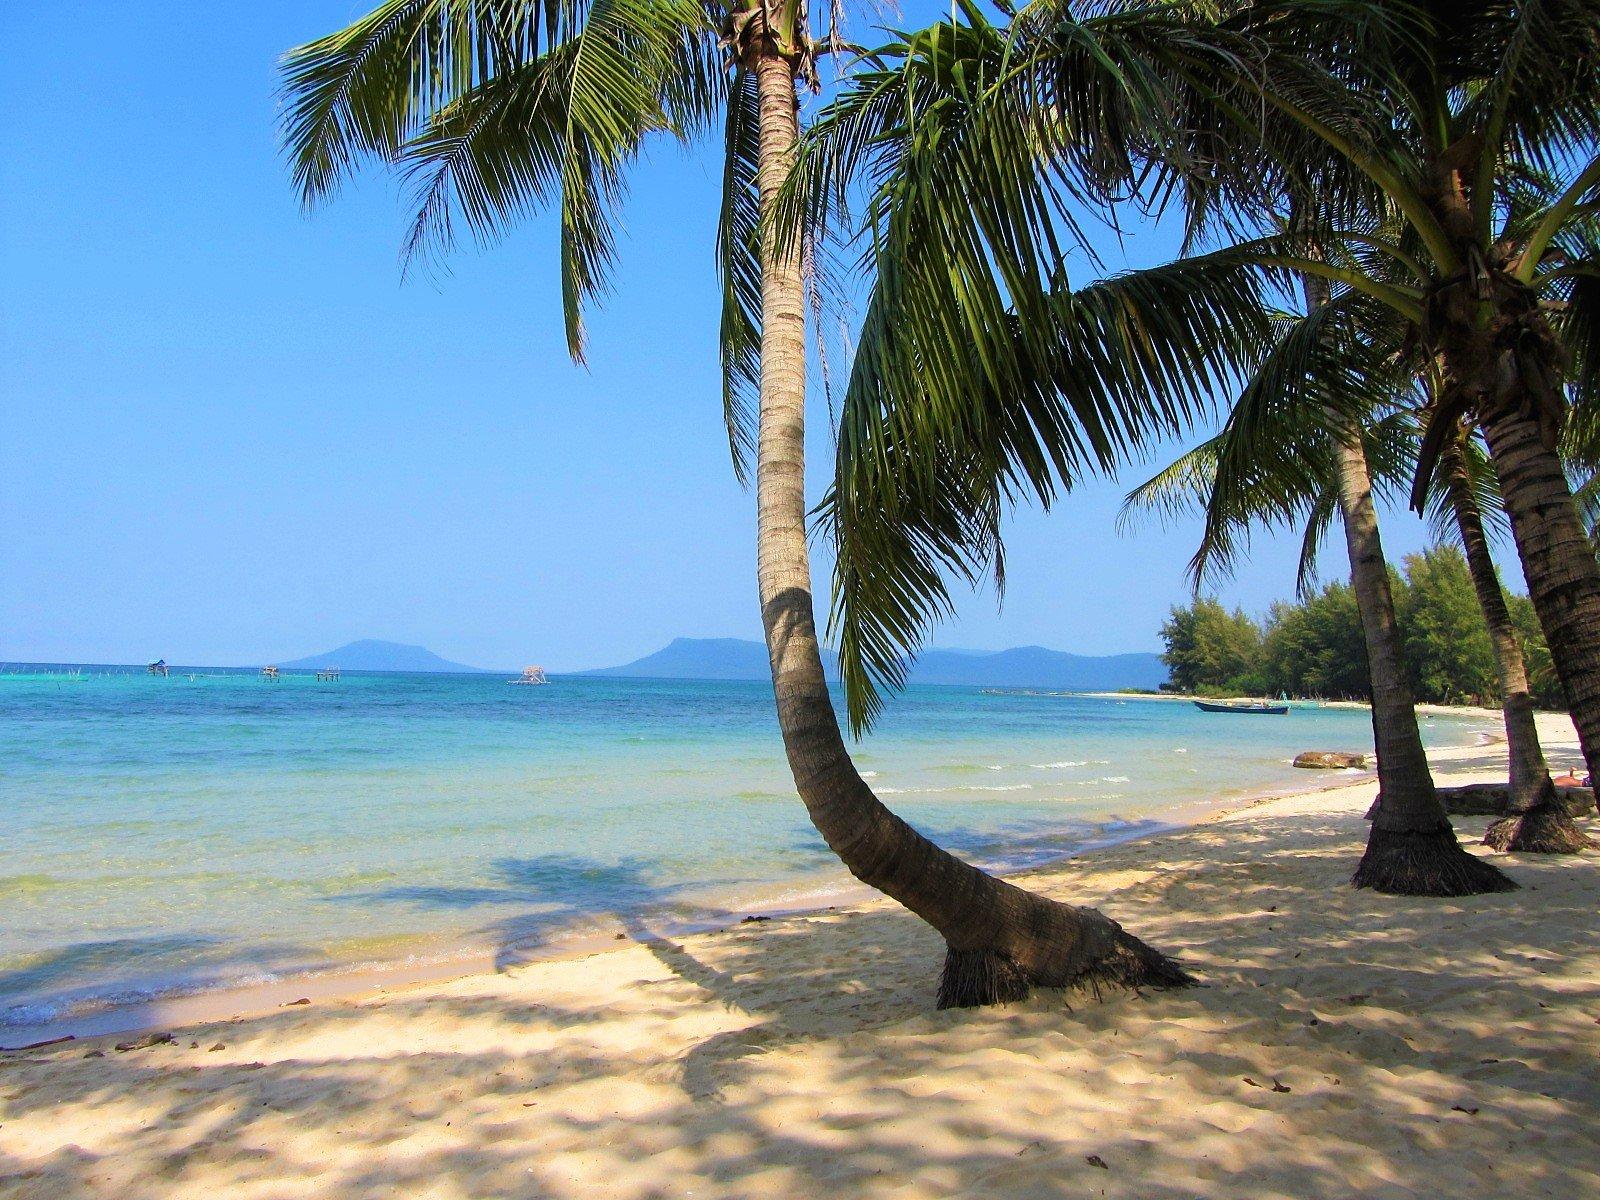 Ganh Dau Beach At The Northwestern Tip Of Phu Quoc Island Is A Gorgeous Palm Fringed Bay